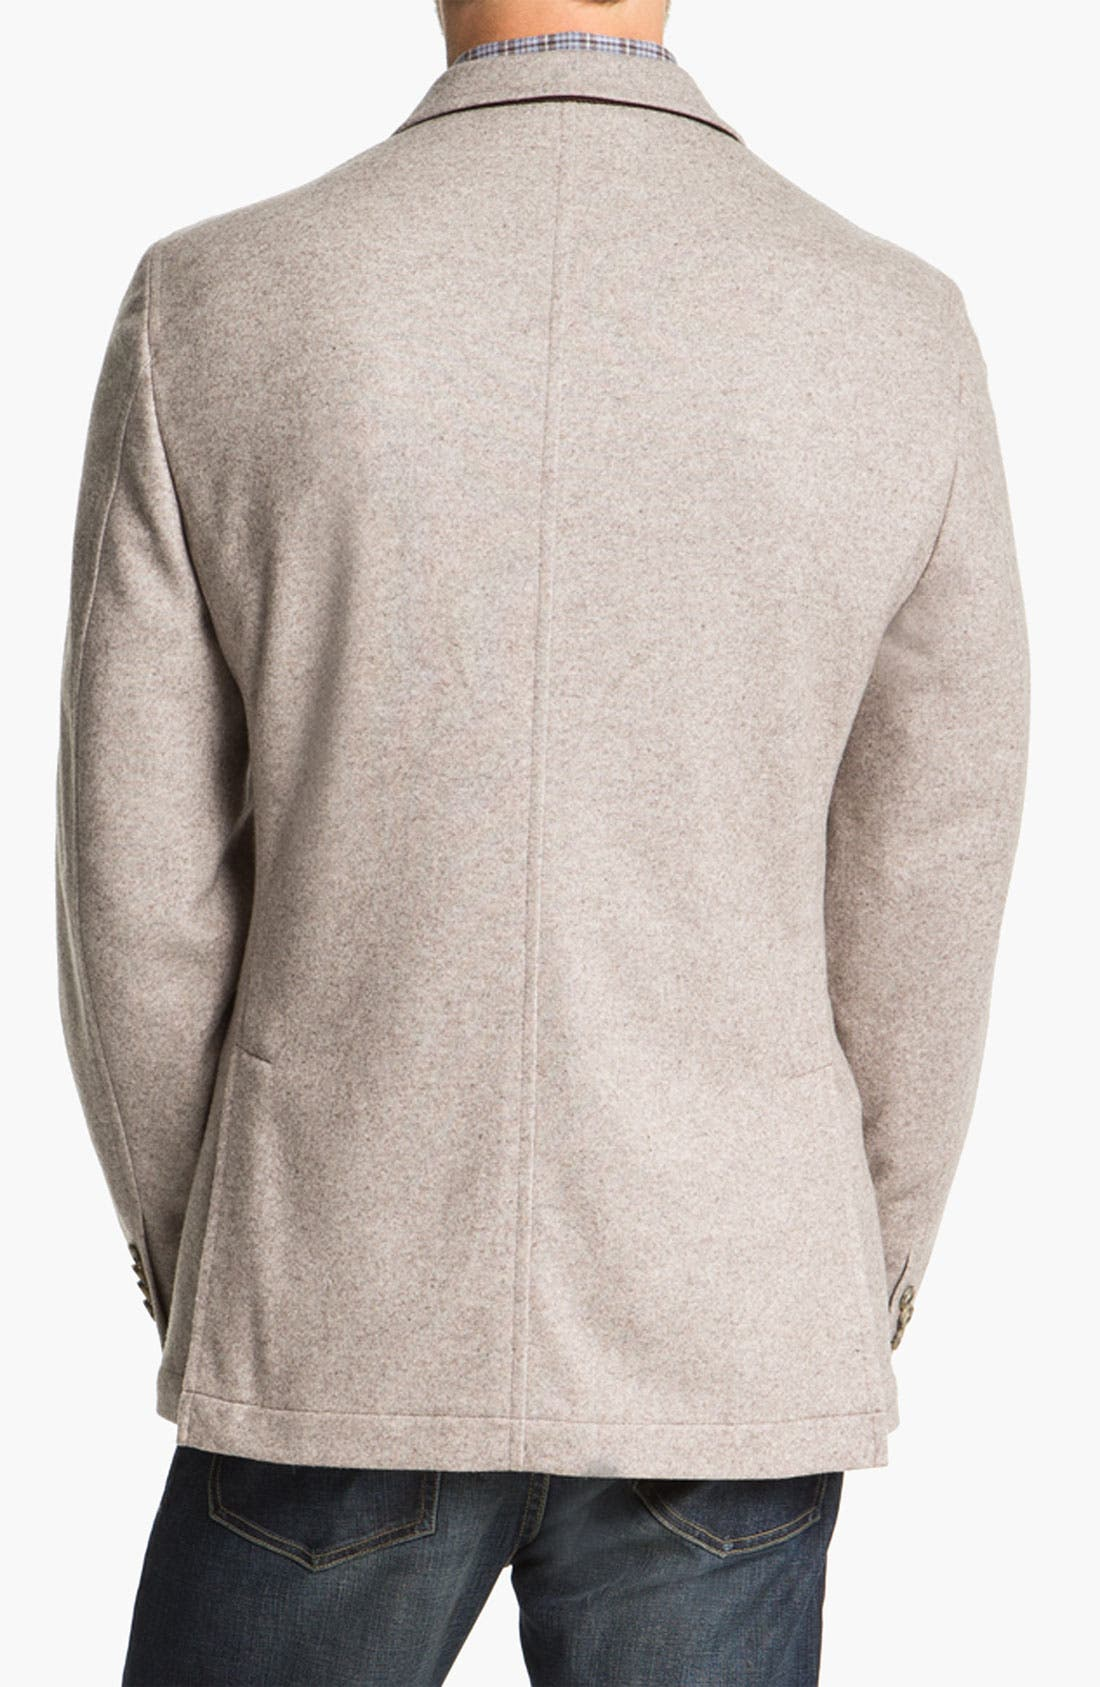 Alternate Image 2  - Kroon 'Mayer' Wool & Cashmere Blend Knit Sportcoat